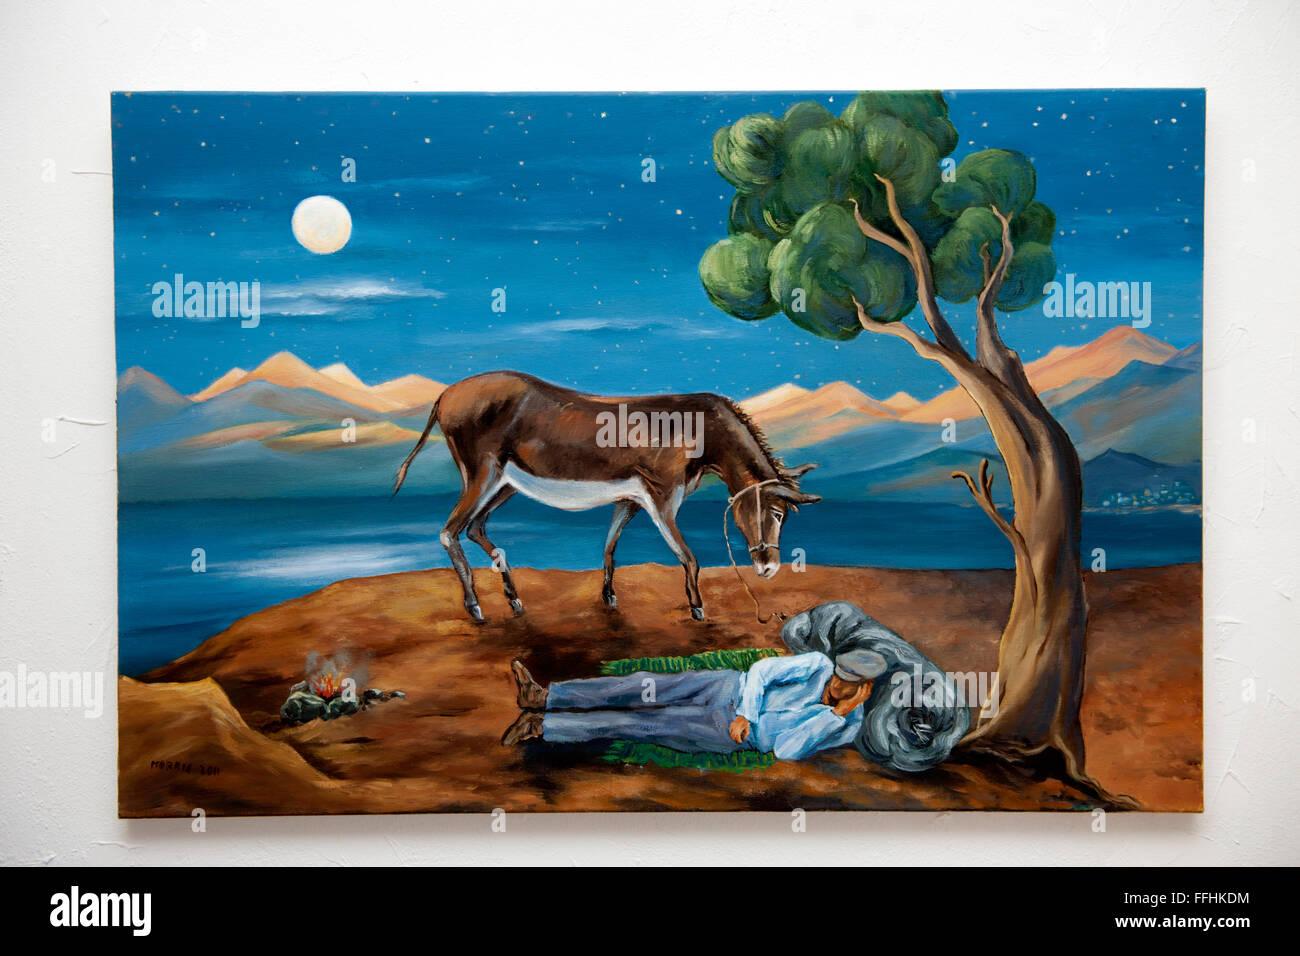 Griechenland, Kreta, Südwesten, Sellia bei Plakias, Bild der Kunstmalerin Marianne Morris - Stock Image